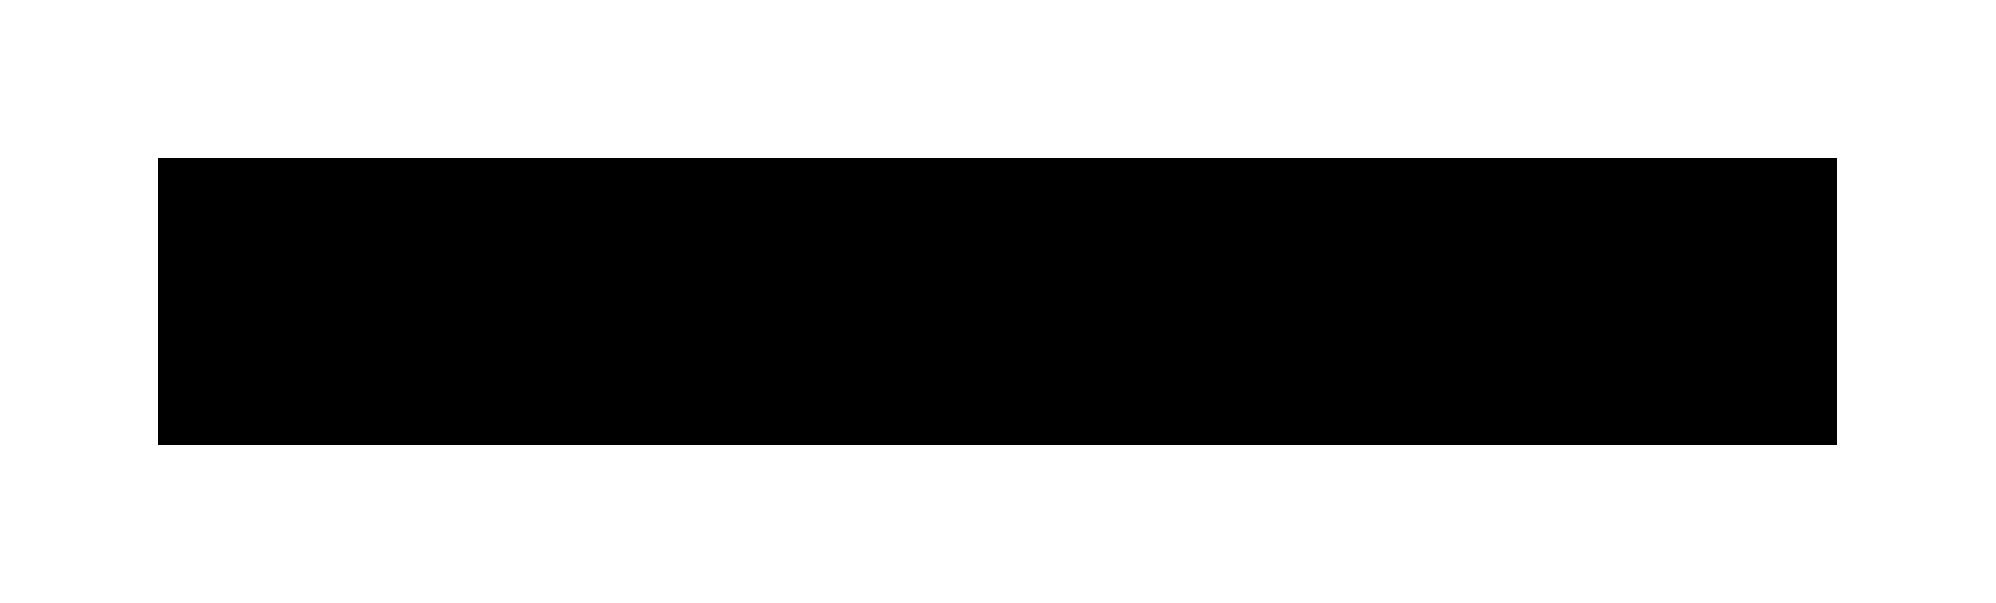 6aefc9c0-aad5-40c9-b132-b016012cbf7e-1600990047872